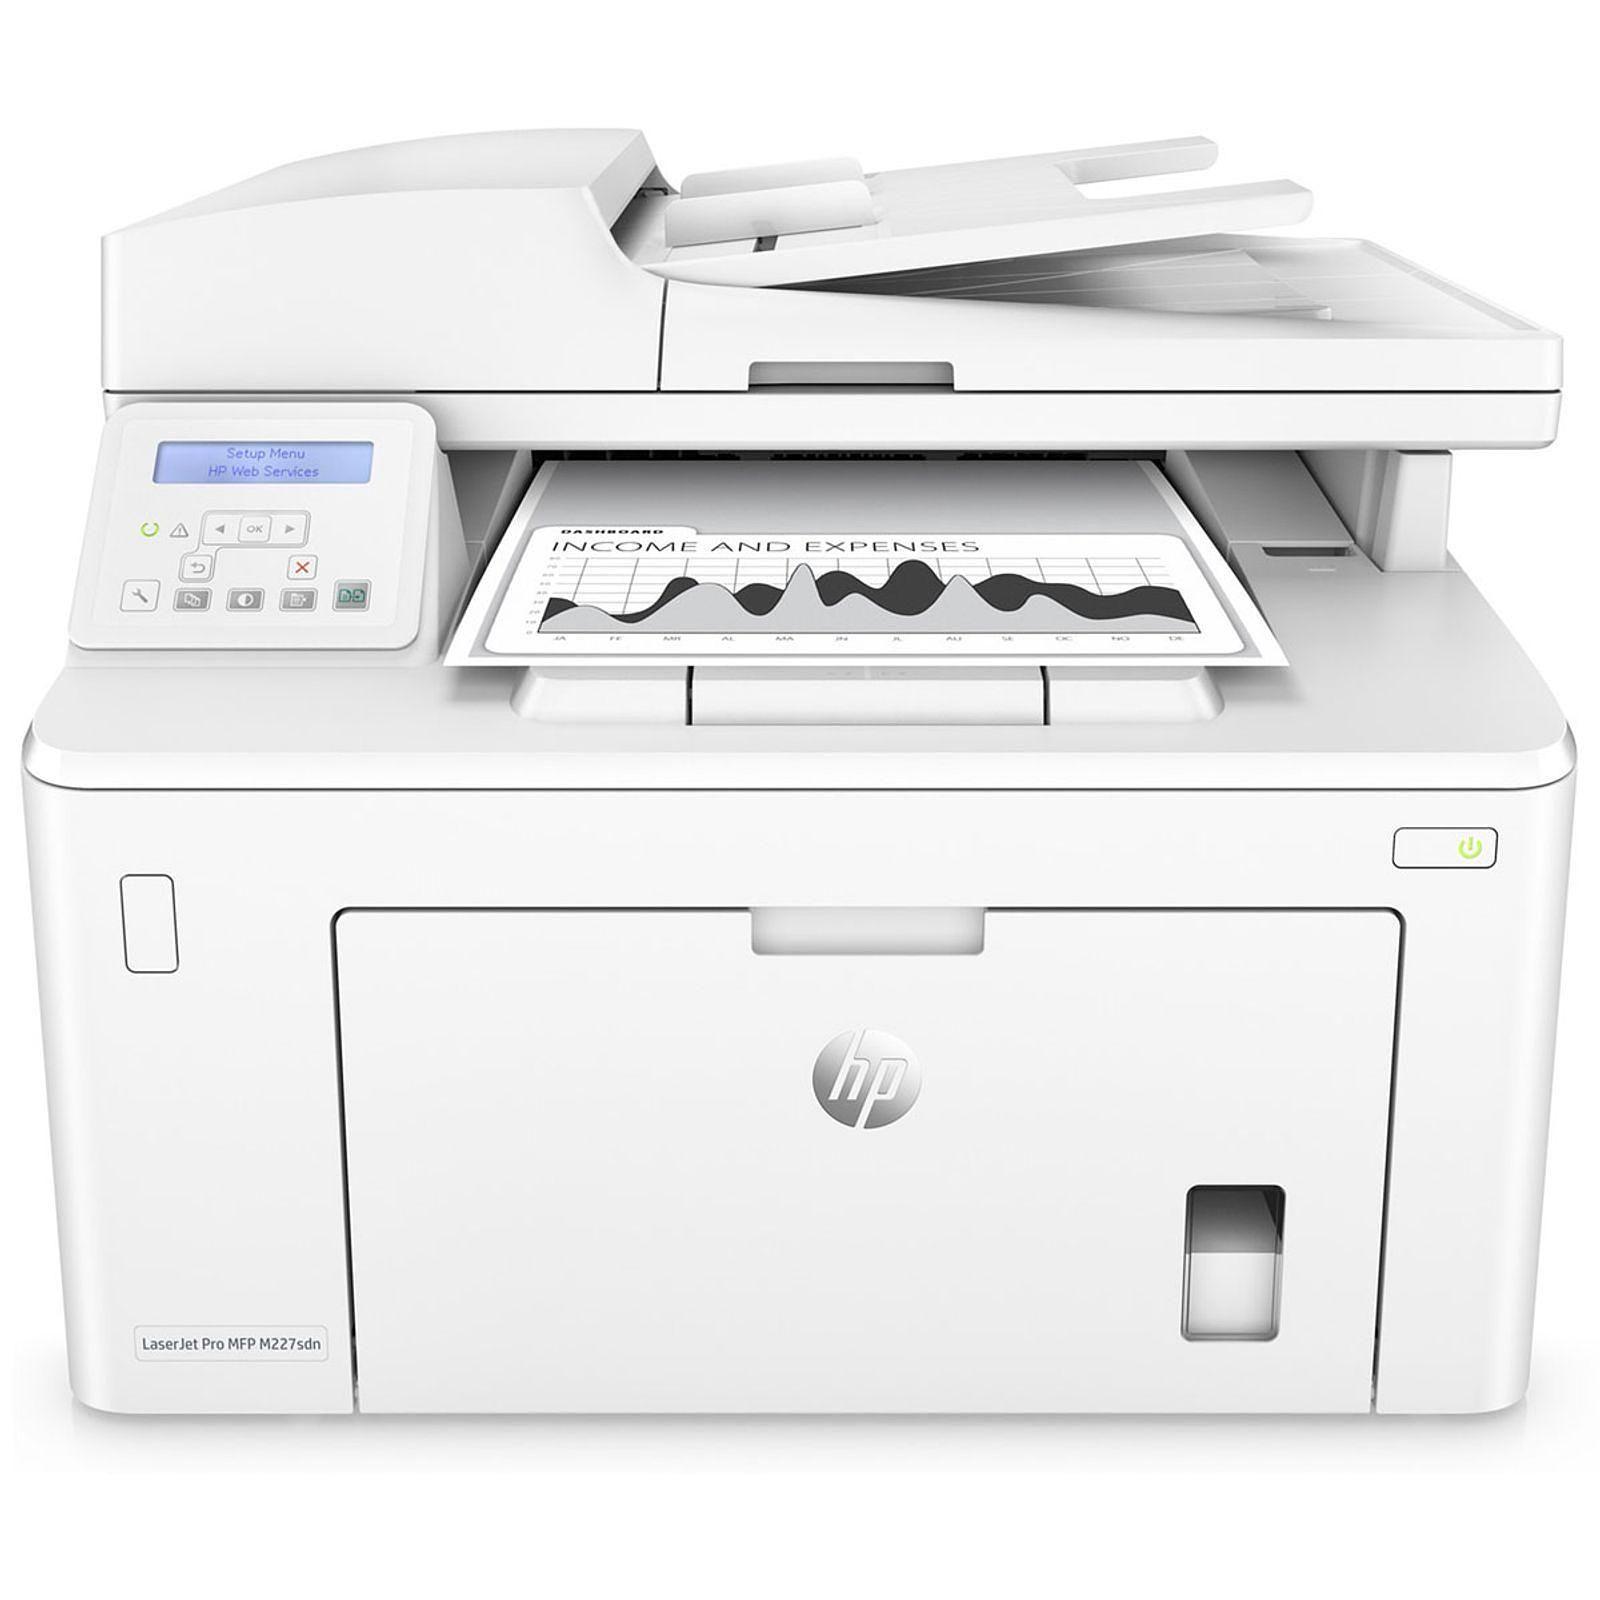 Imprimante multifonction HP LaserJet Pro MFP M227sdn - Cybertek.fr - 0